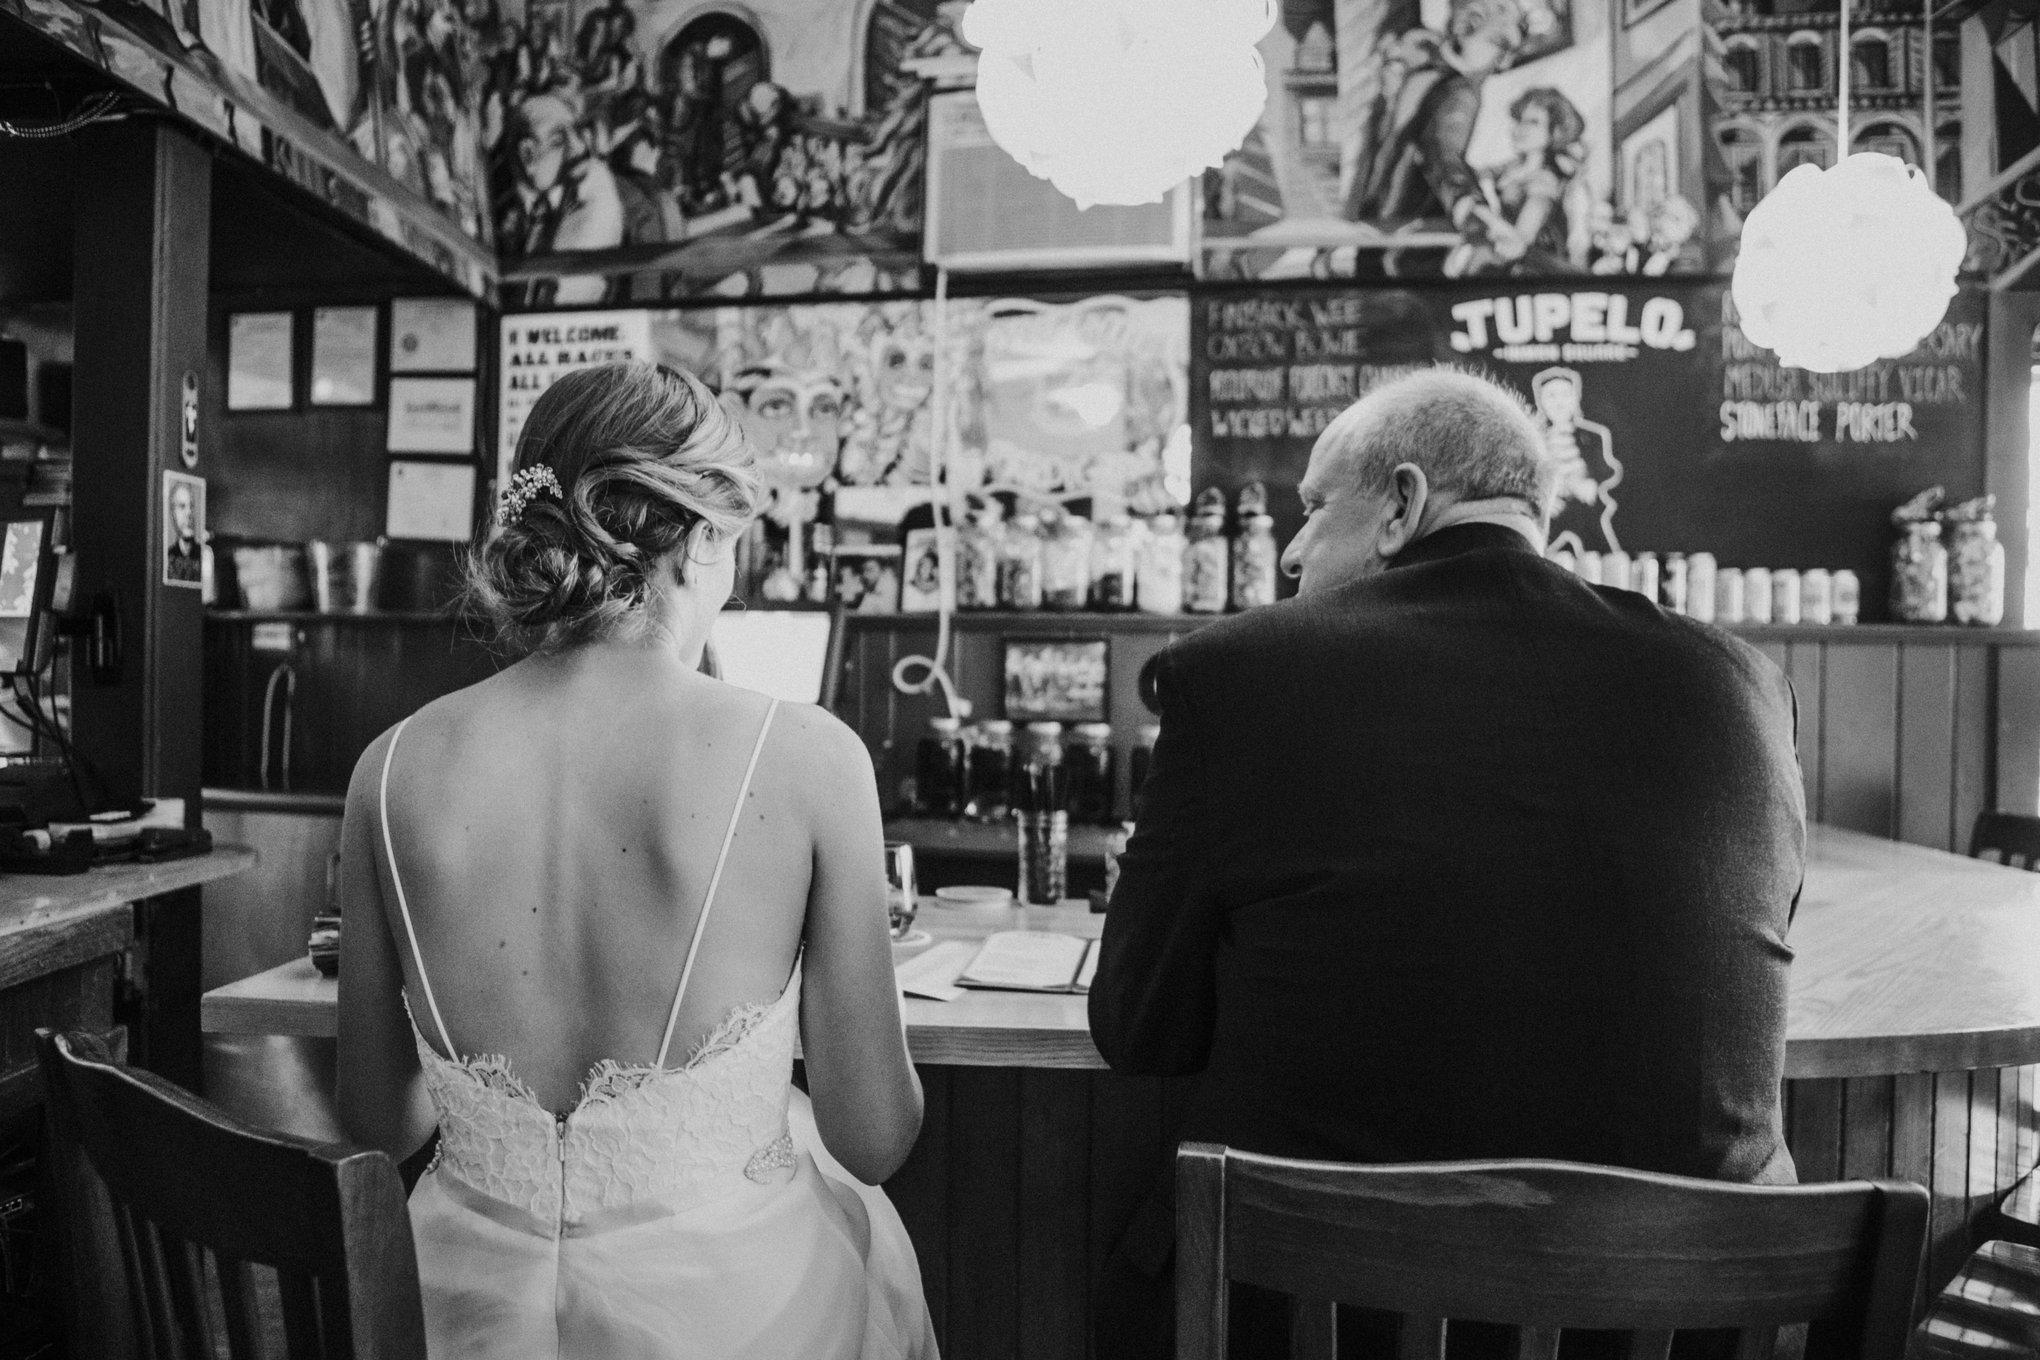 Lena_Mirisola_2017_Weddings_-009.jpg